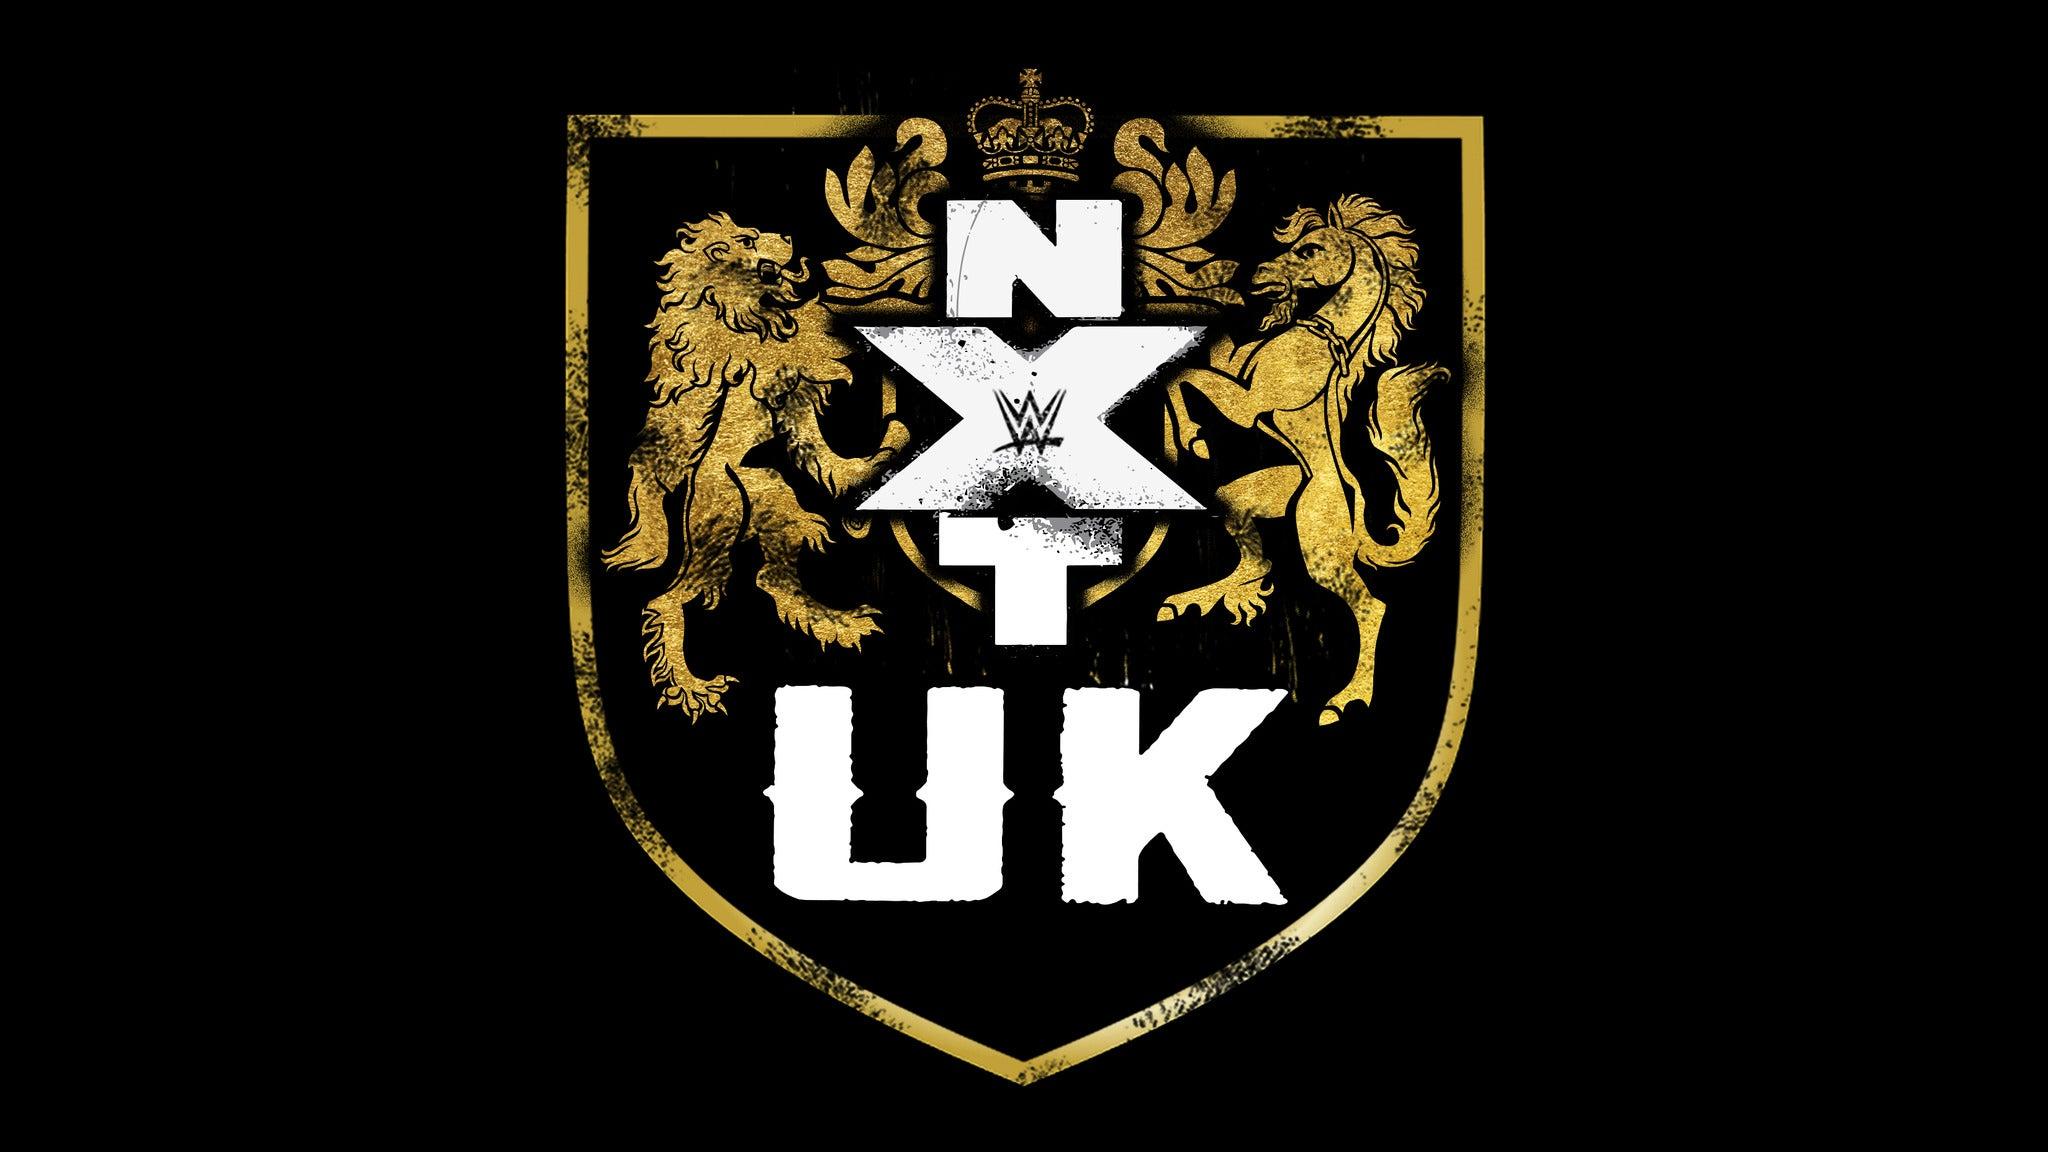 WWE NXT UK Live Glasgow - 2 Day Ticket tickets (Copyright © Ticketmaster)